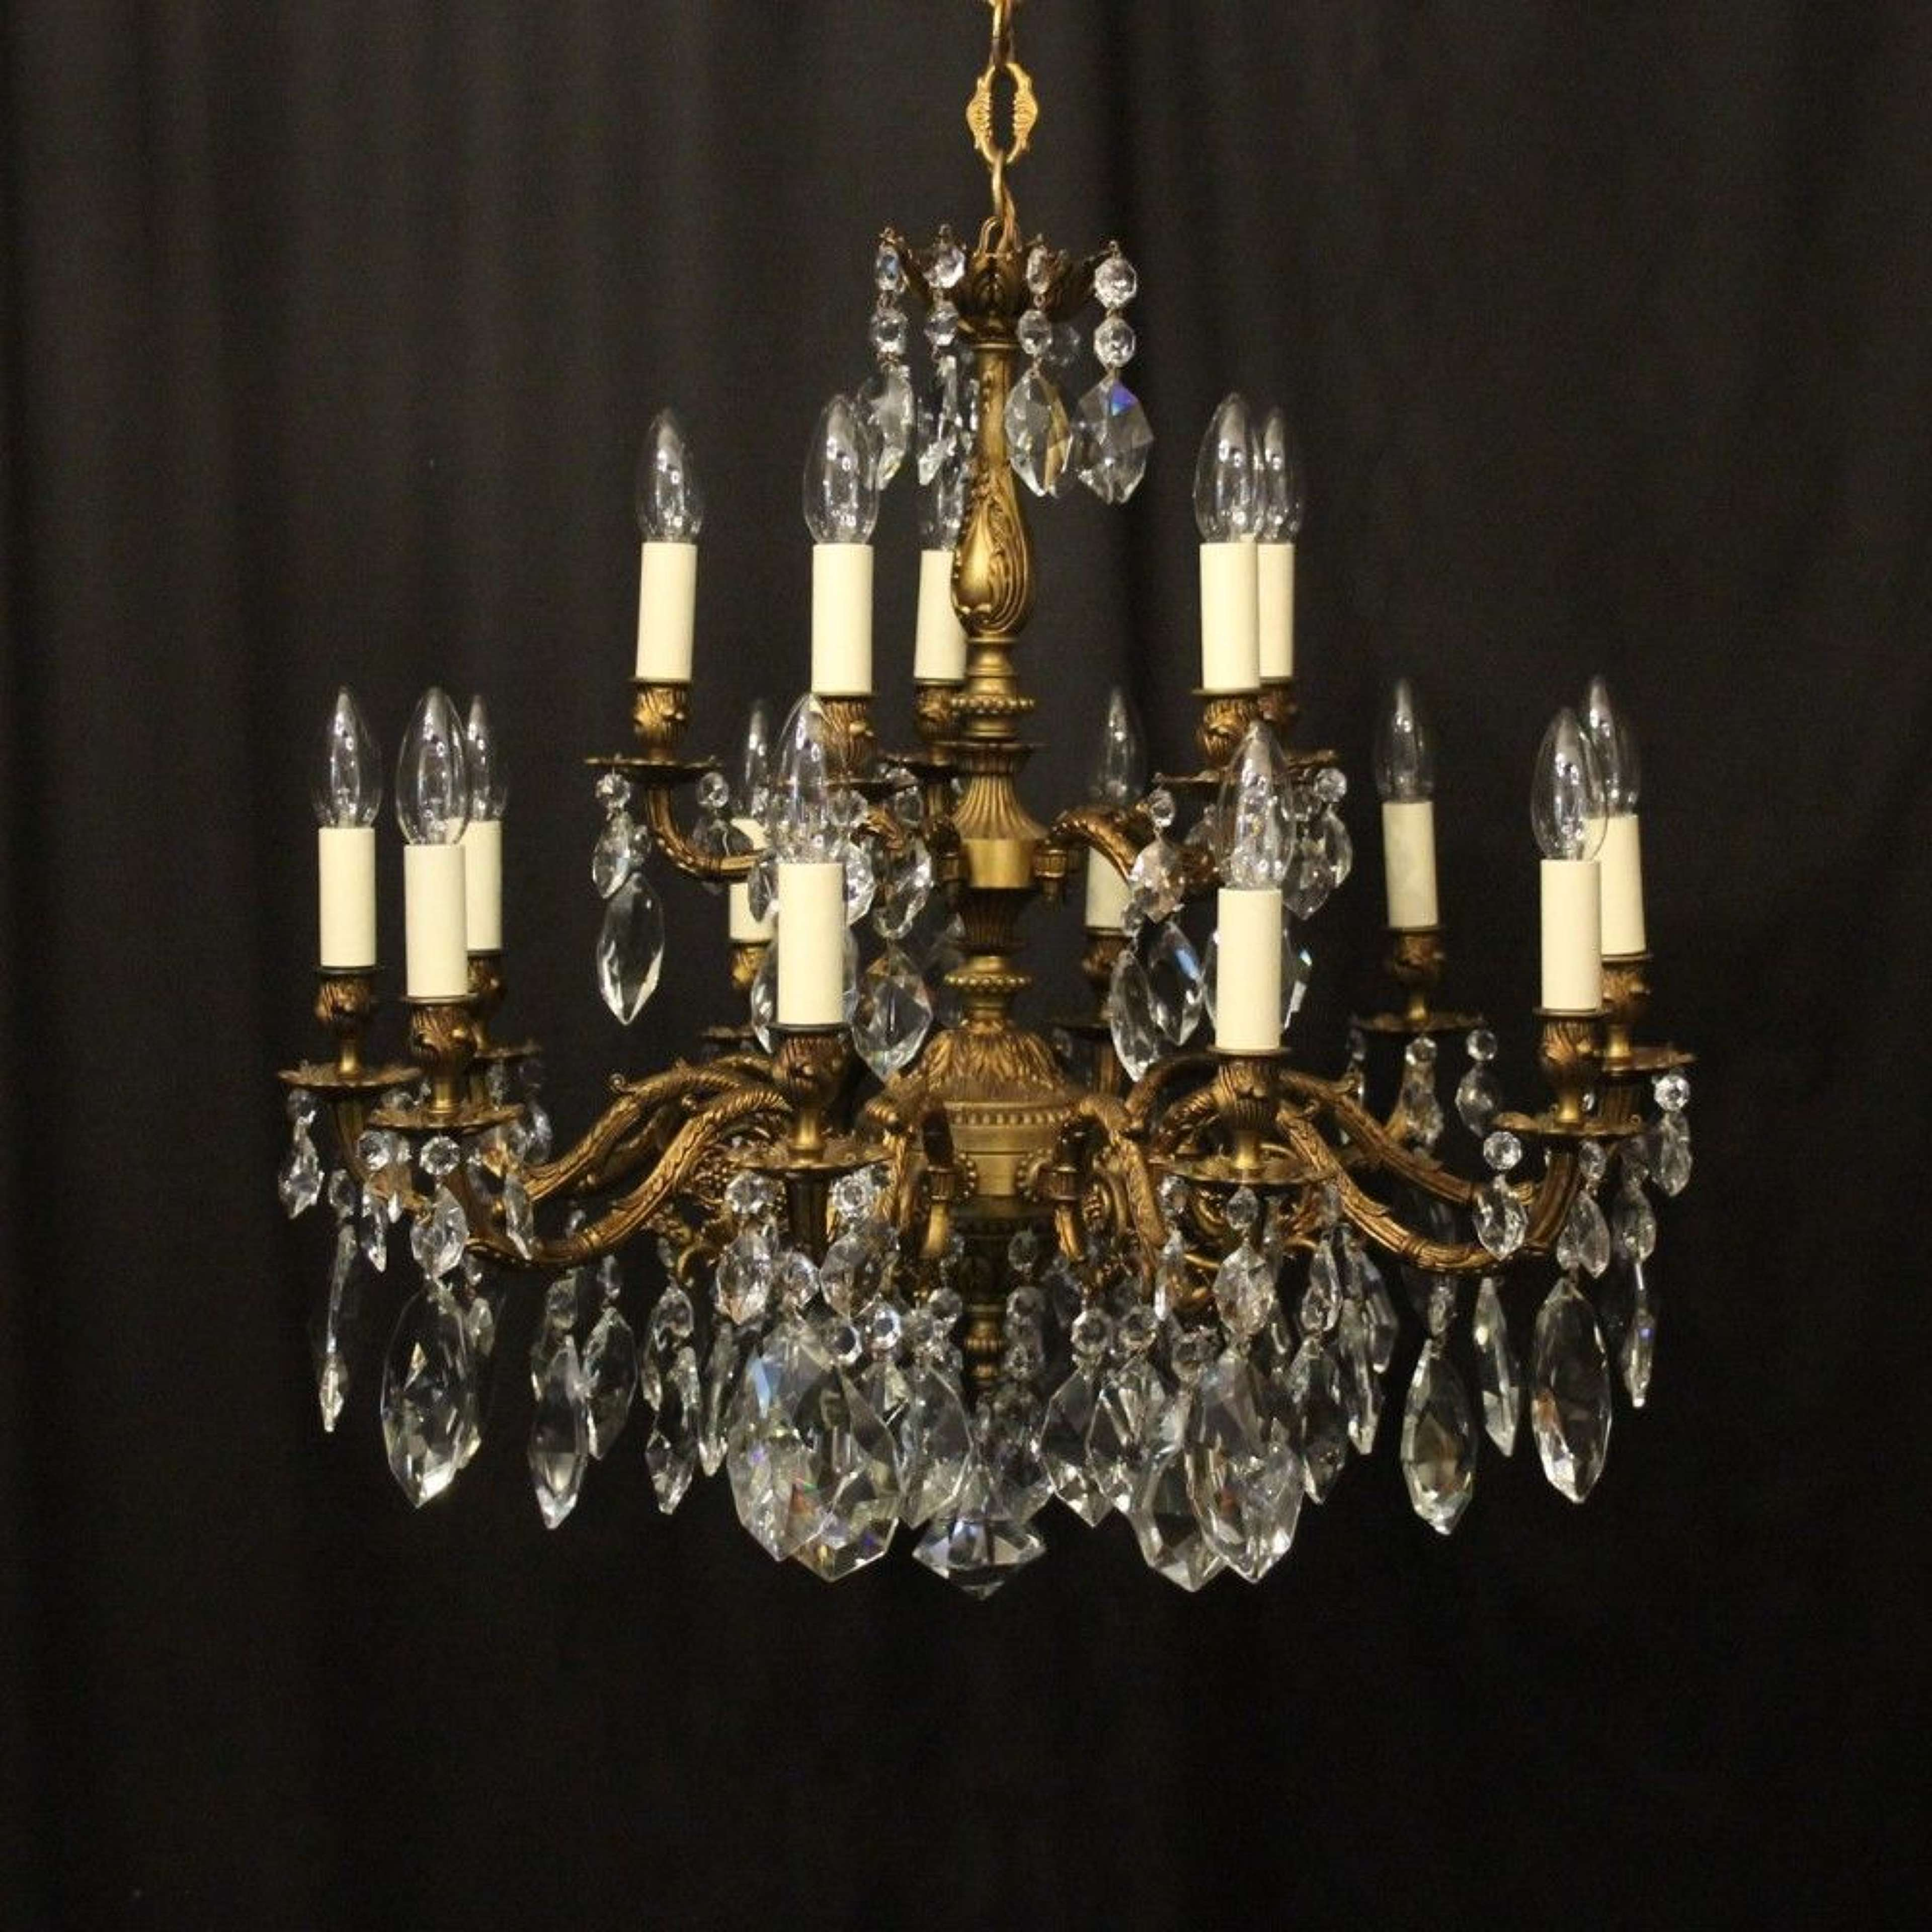 Italian Gilded 15 Light Double Tiered Antique Chandelier